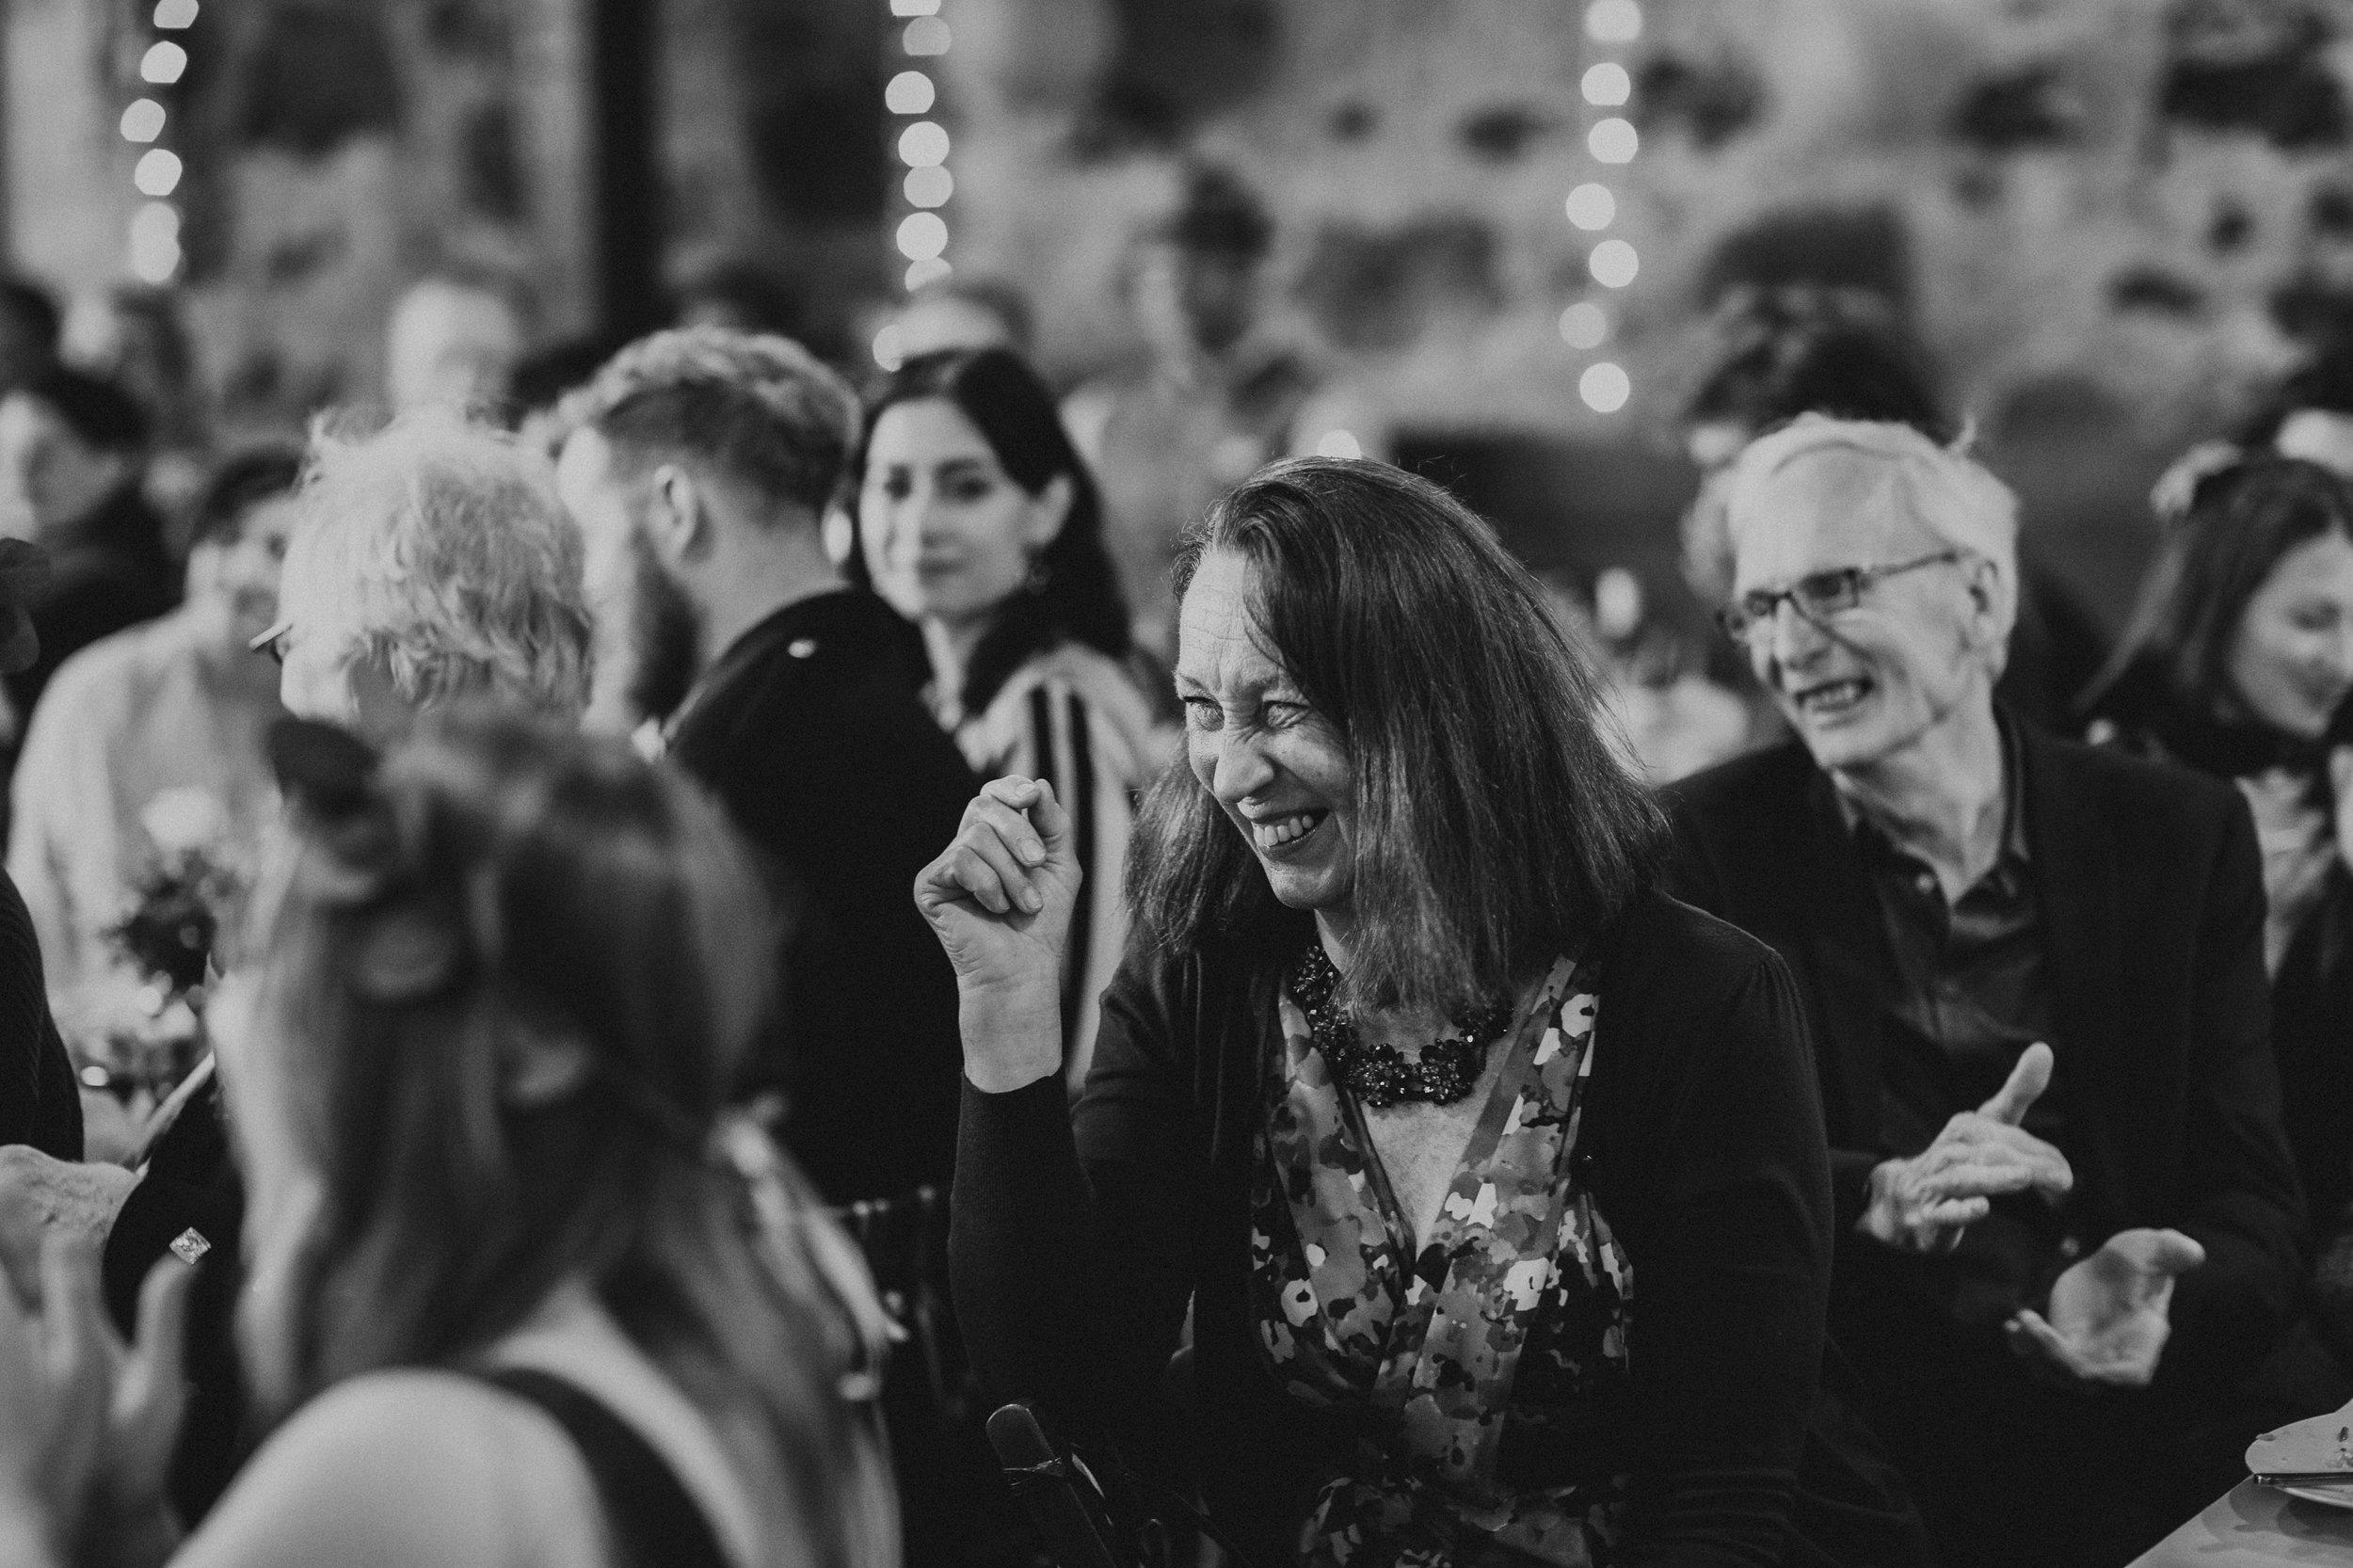 COMRIE_CROFT_WEDDINGS_PJ_PHILLIPS_PHOTOGRAPHY_157.jpg